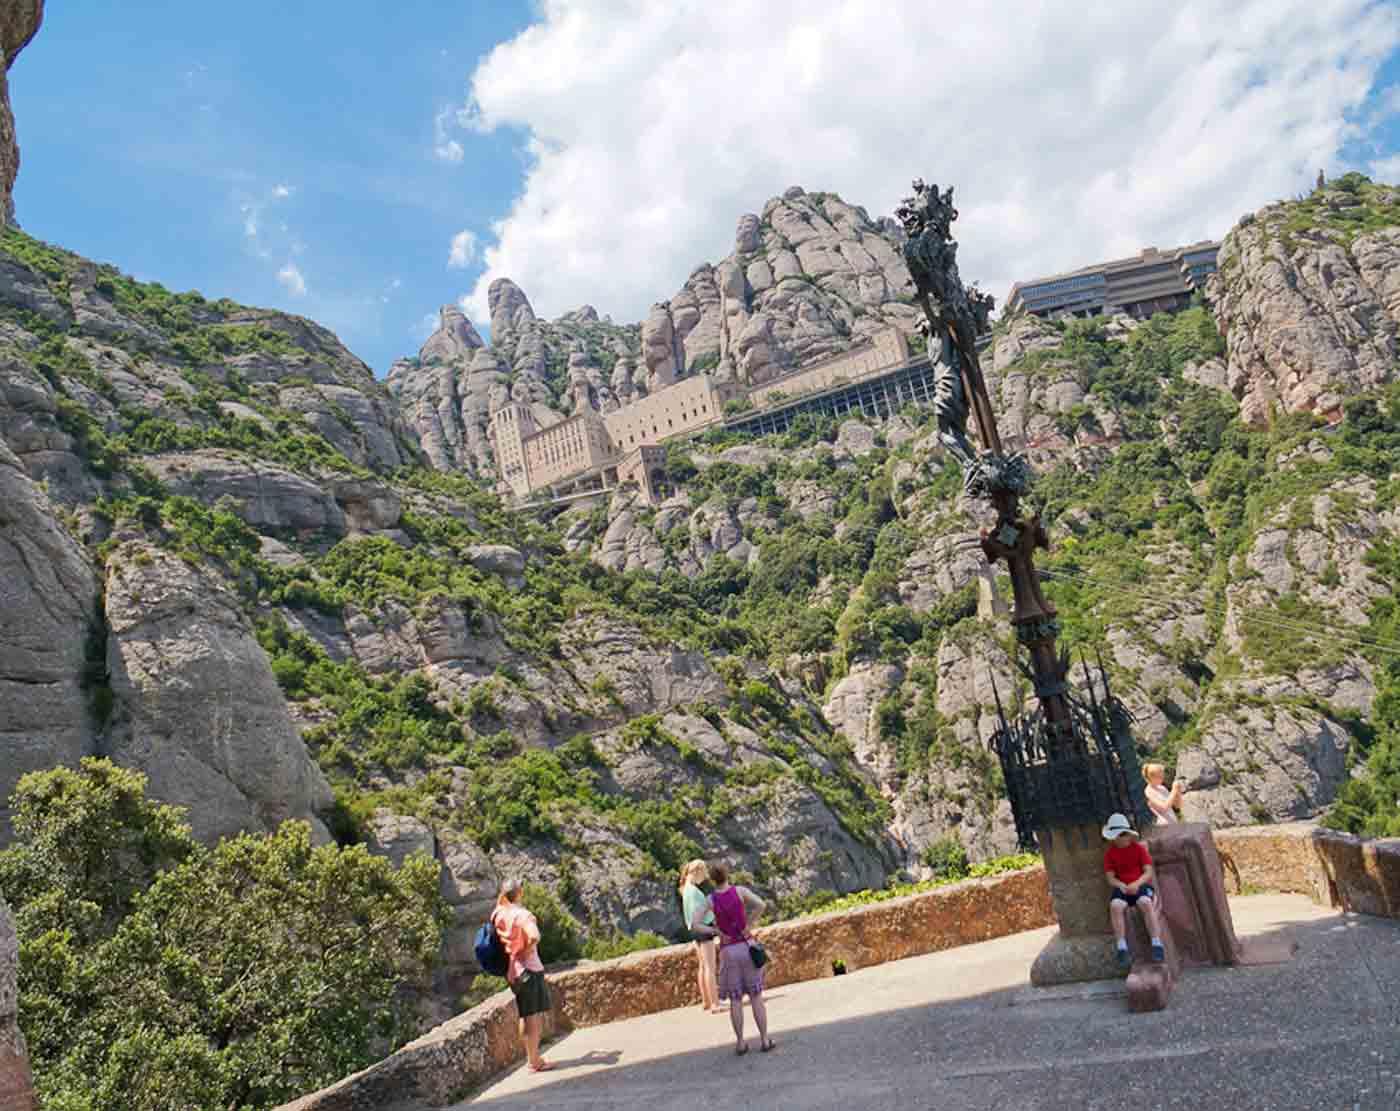 Monastery of Monserrat half day tour from Barcelona